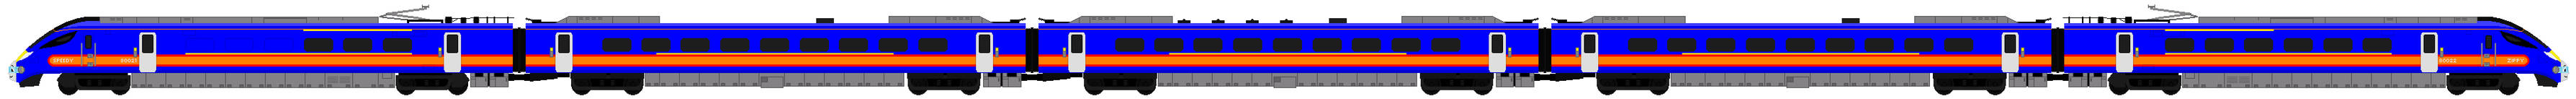 The Vicarstown to Edinburgh Express